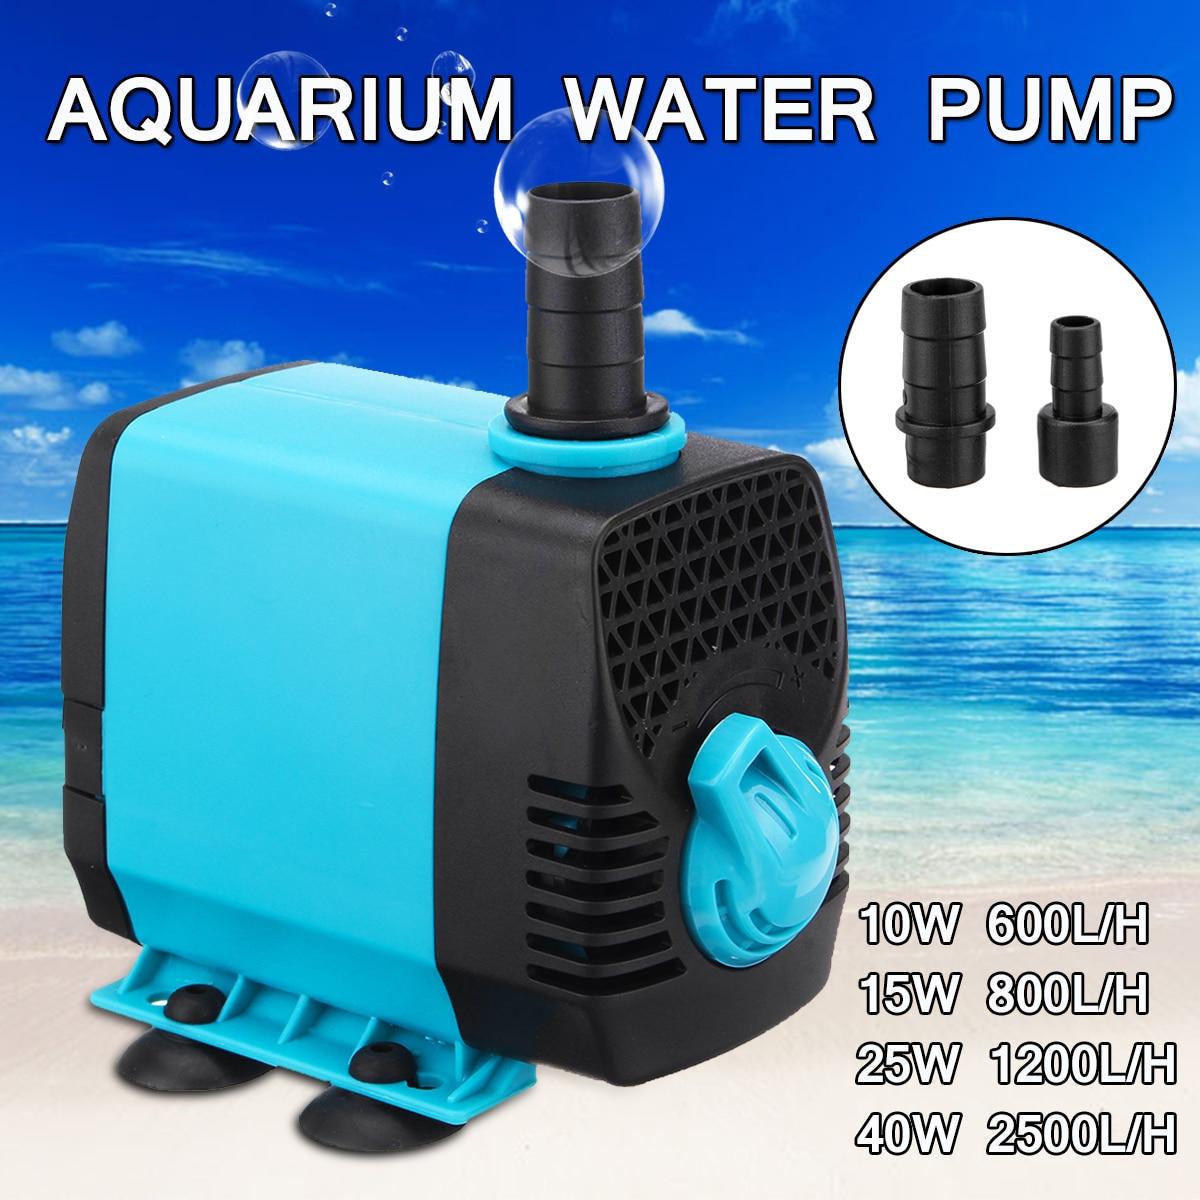 10/15/25/40W 220V Multifunctional Aquarium Water Pumps Tank Pond Pool Fountains Pump Waterproof Submersible Fish Pond Water Pump